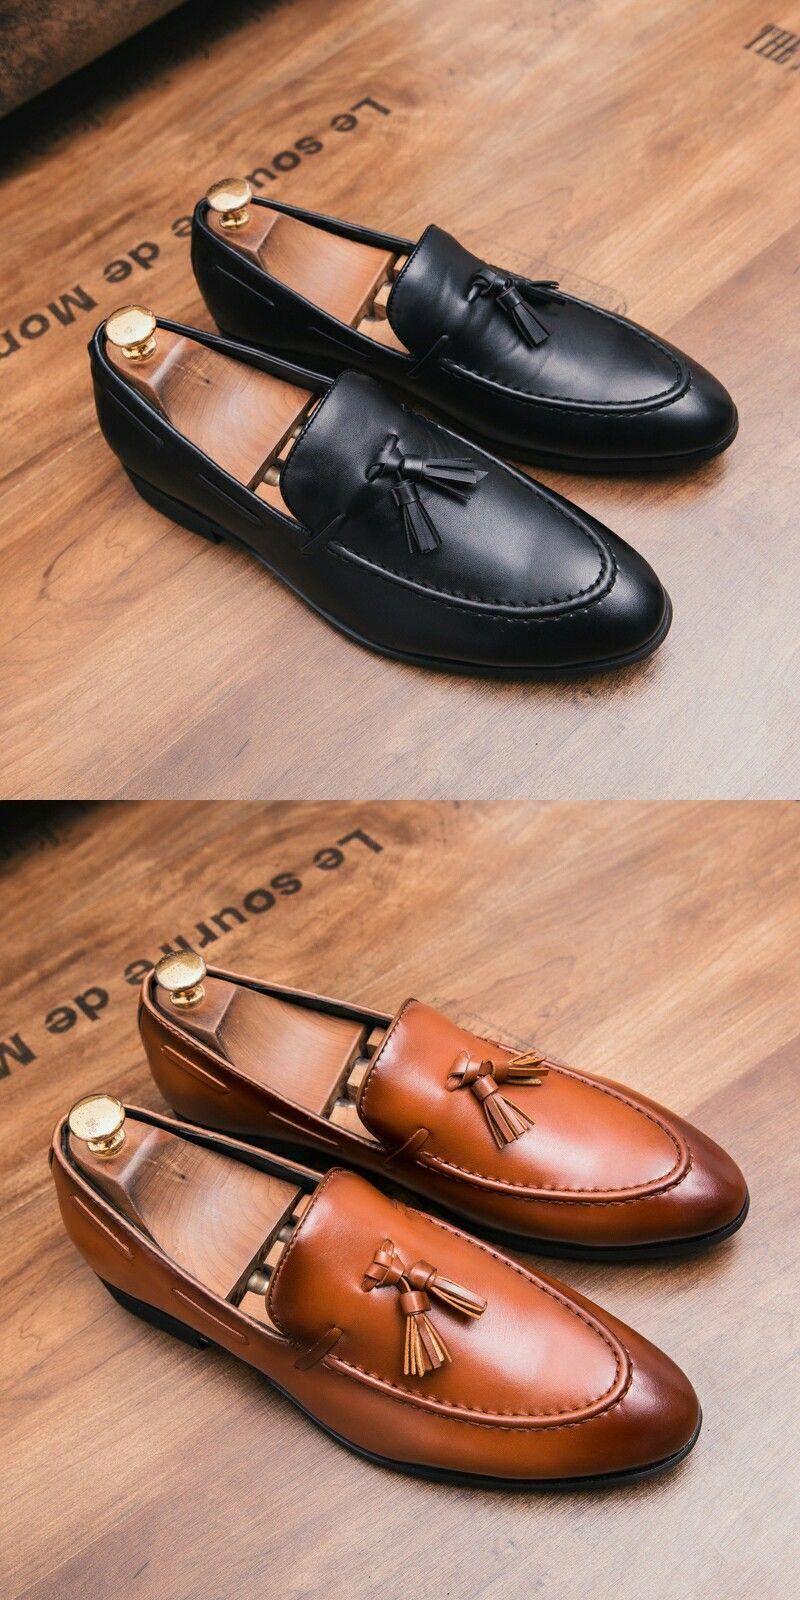 8f1e78f4f47 US  26.2  Click to buy  Prelesty New Classic Elegant Italian Men Penny  Loafer Formal Dress Wedding Shoes Luxury Style  italianweddingshoes